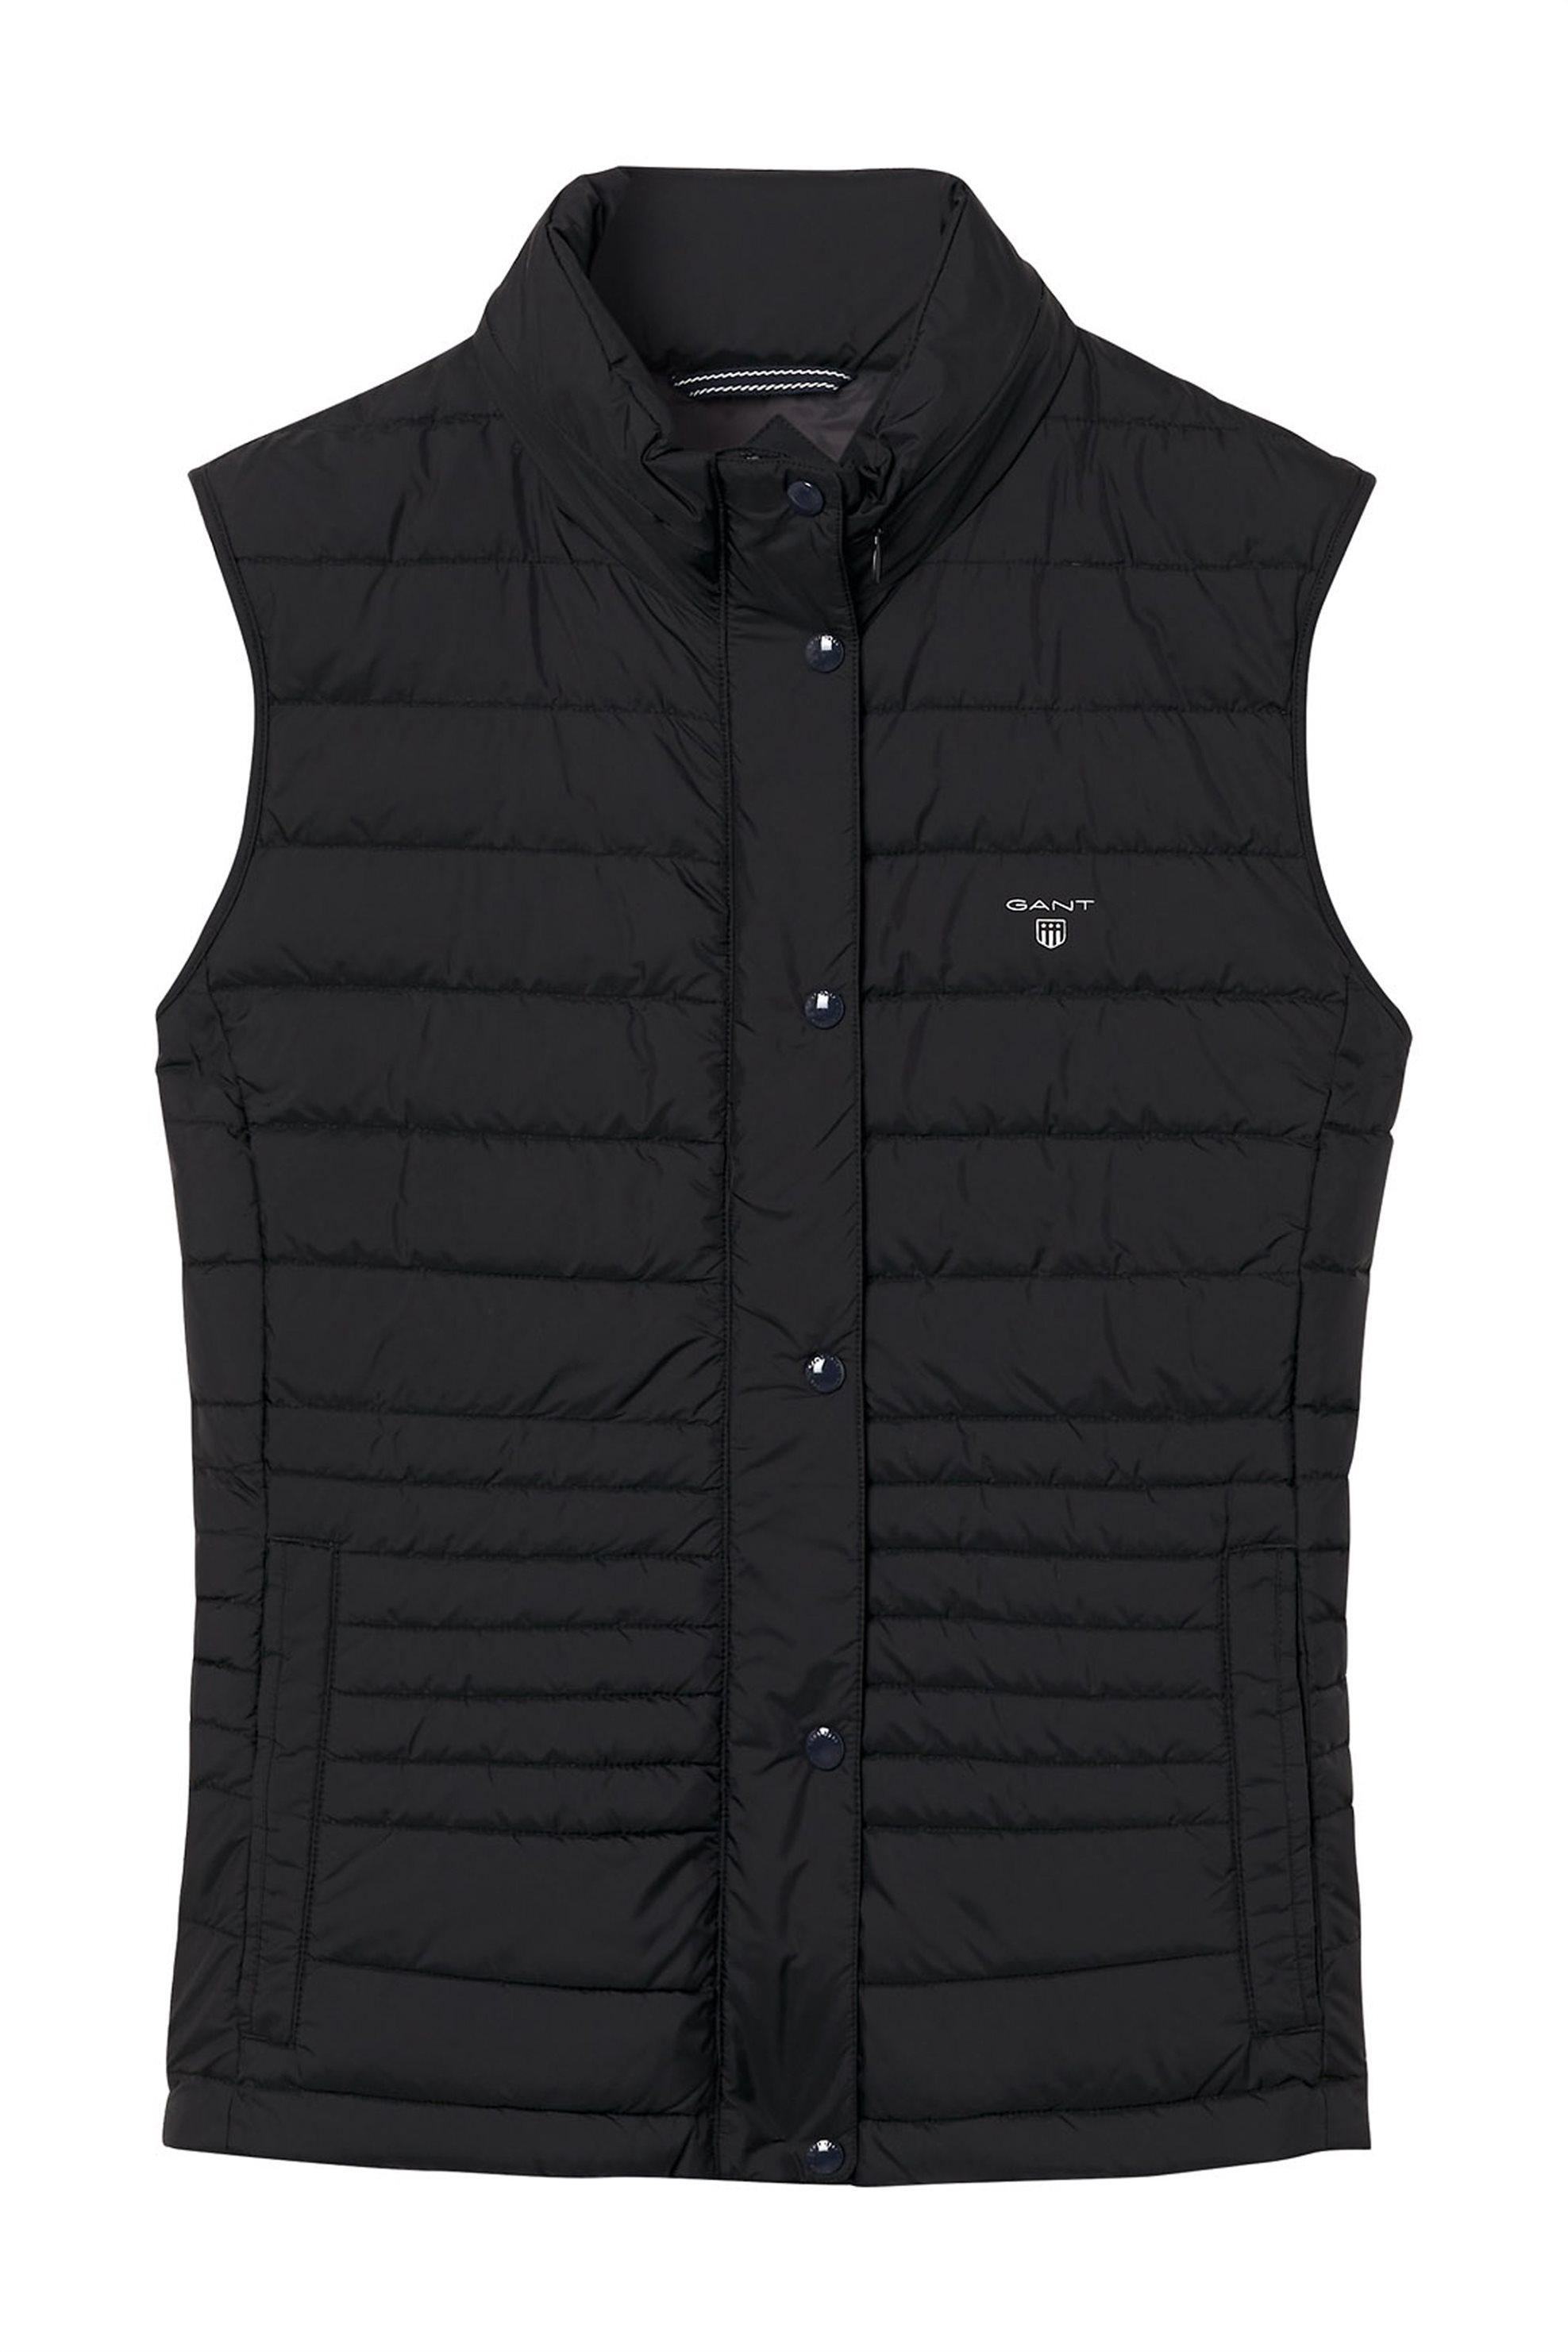 Gant γυναικείο αμάνικο καπιτονέ μπουφάν μονόχρωμο - 4700037 - Μαύρο γυναικα   ρουχα   πανωφόρια   μπουφάν   σακάκια   αμάνικα μπουφάν